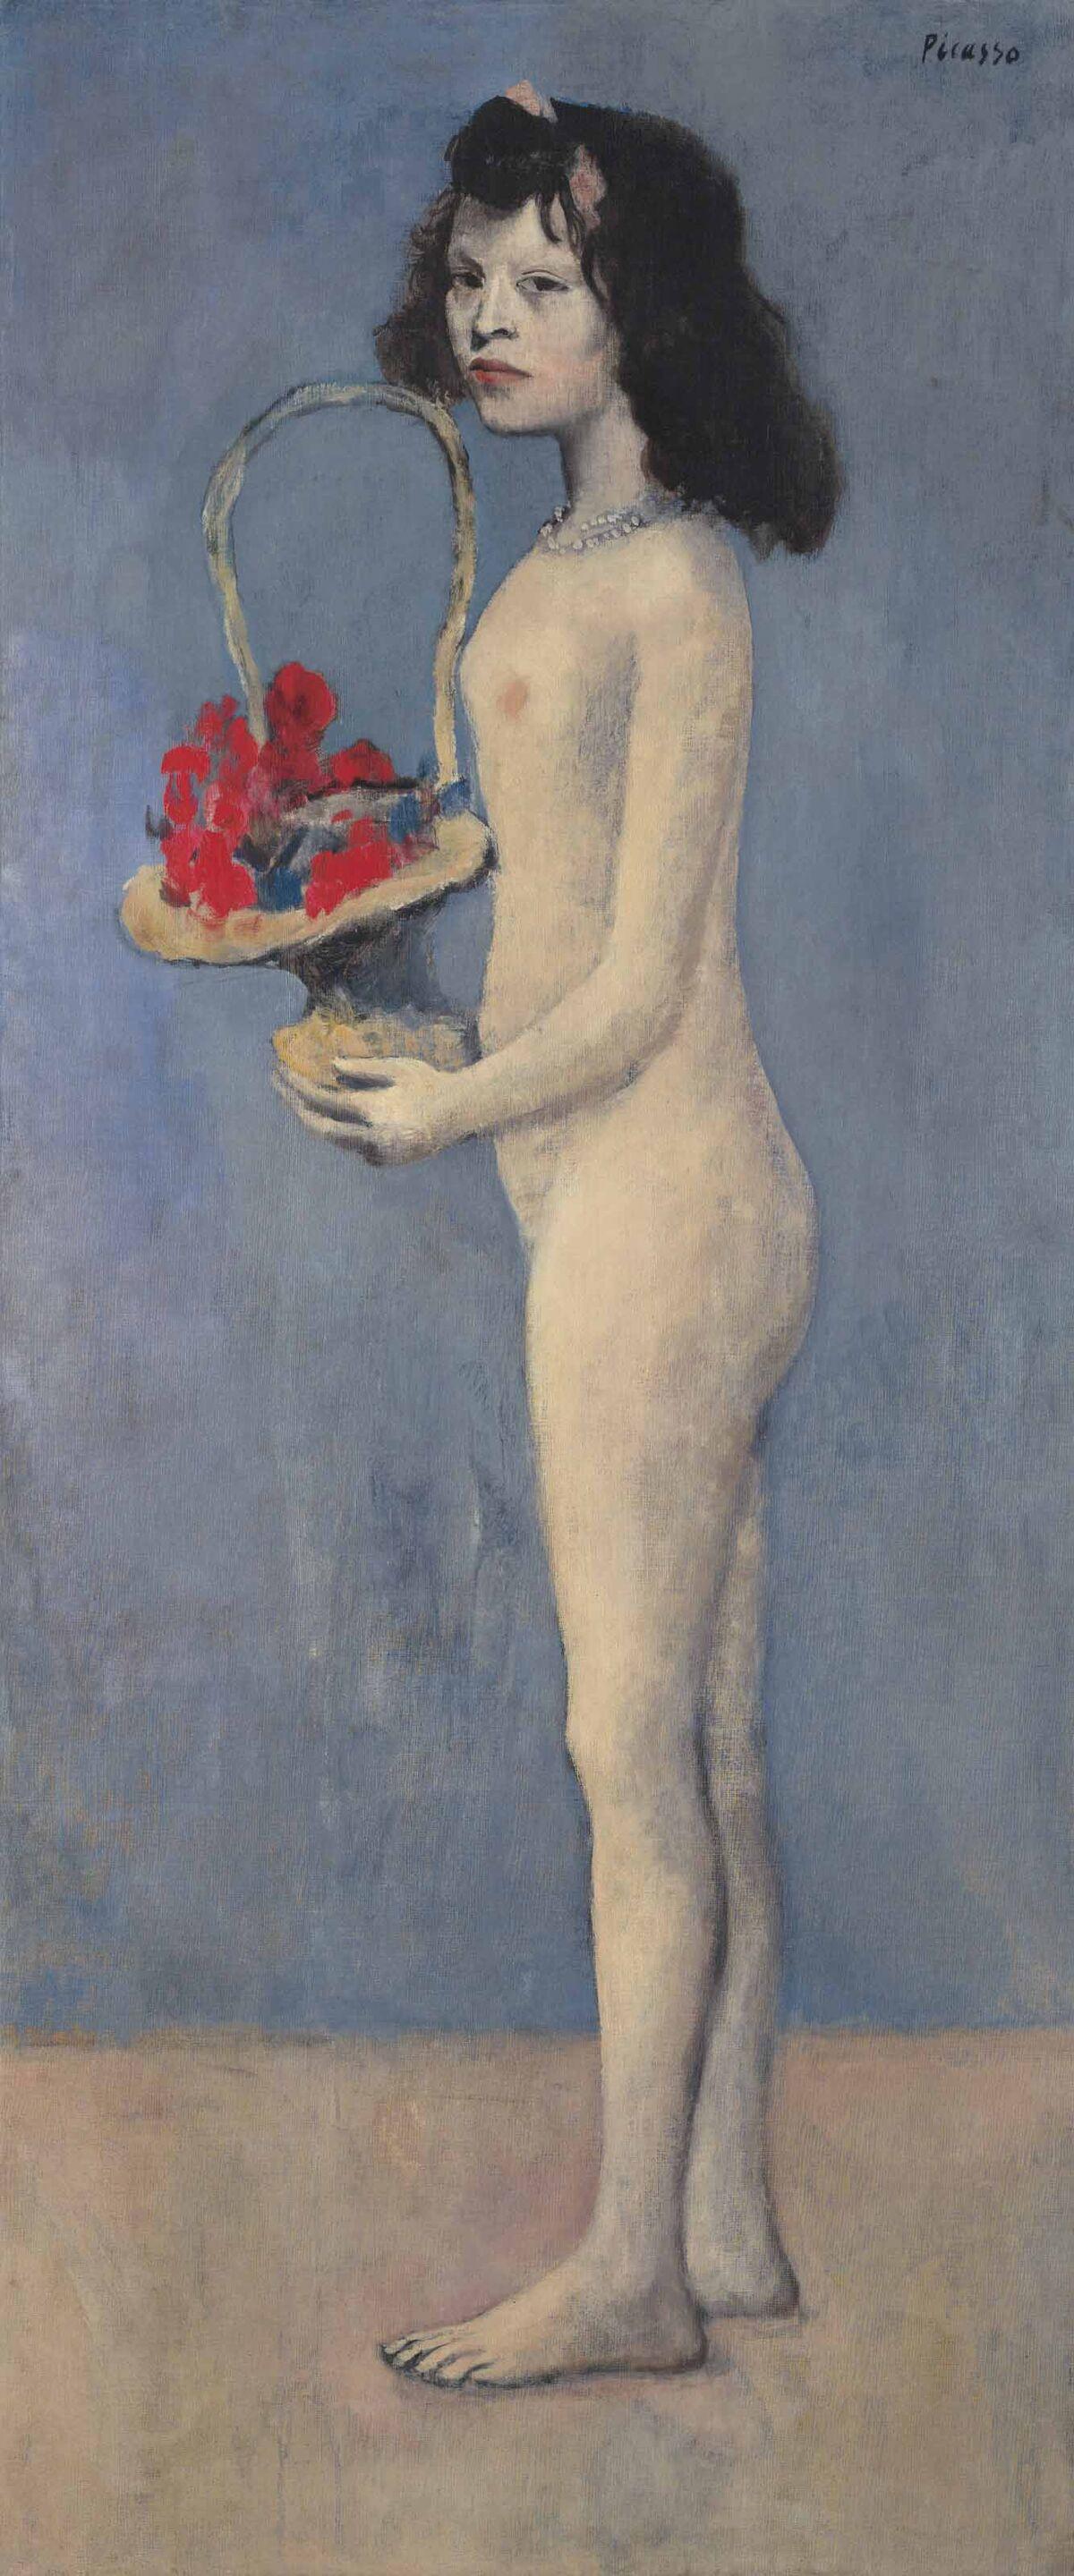 Pablo Picasso, Fillette à la corbeille fleurie, 1905. Courtesy of Christie's.